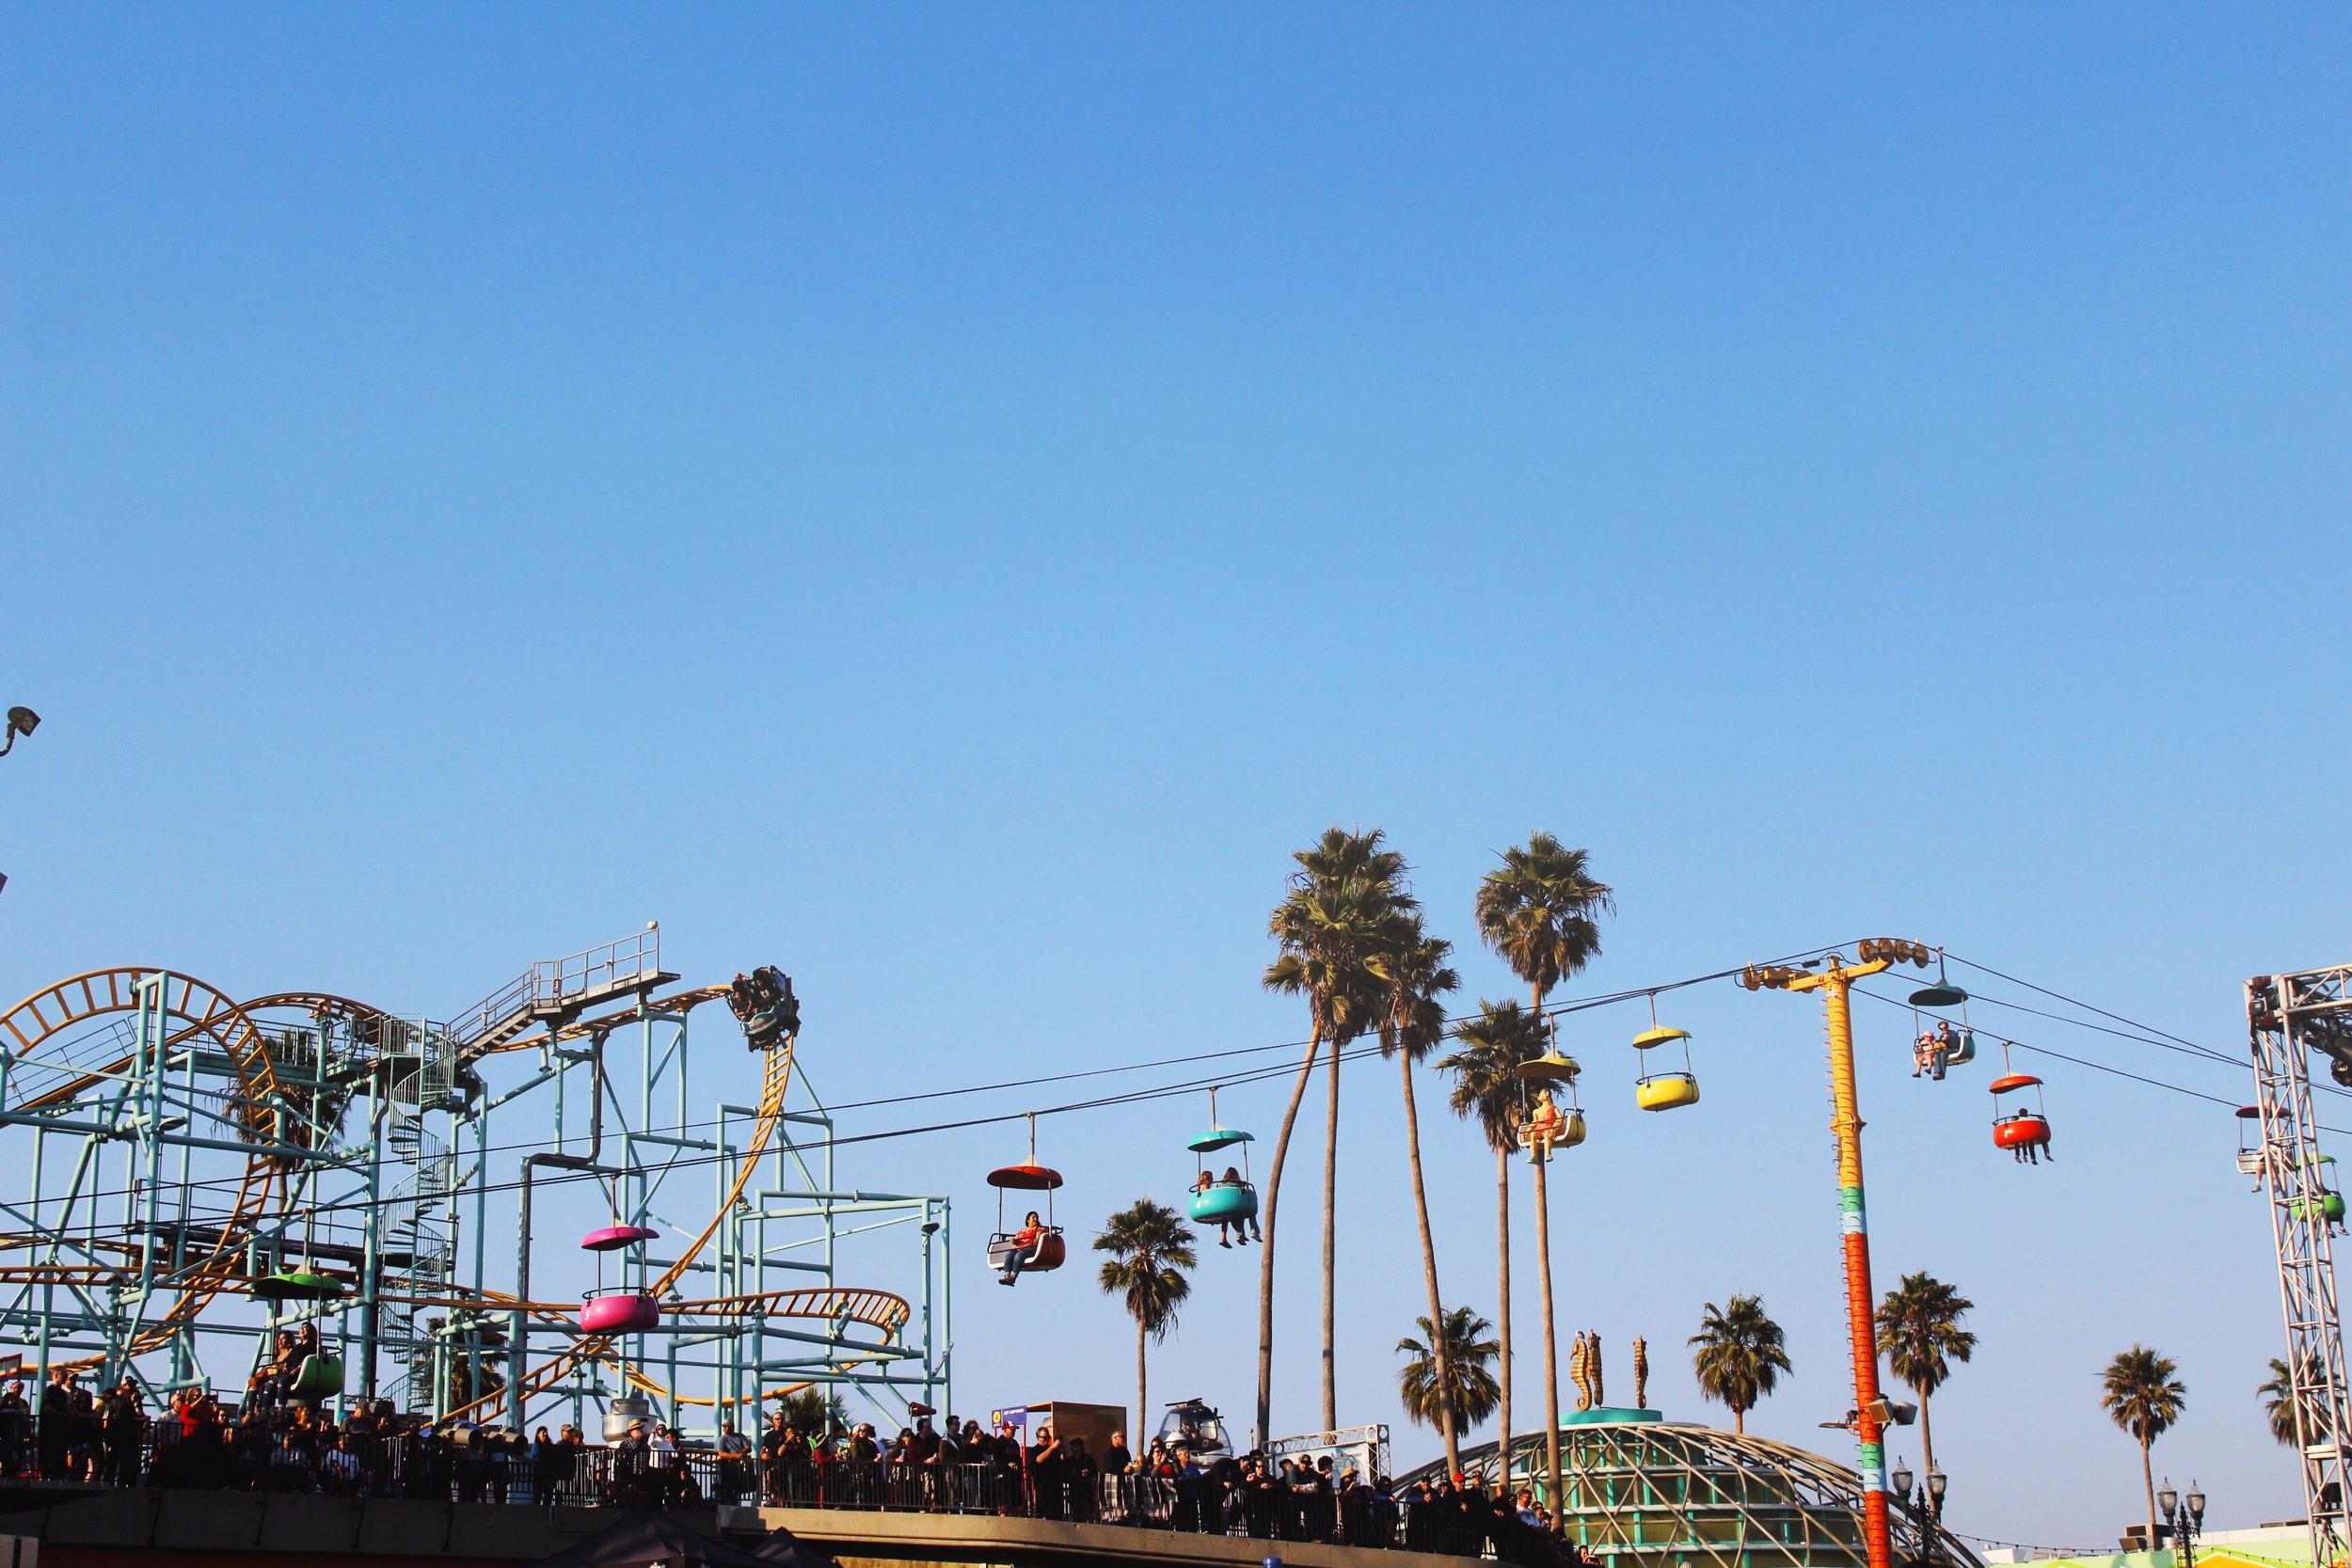 Santa Cruz Beach Boardwalk in the warm California Sun.